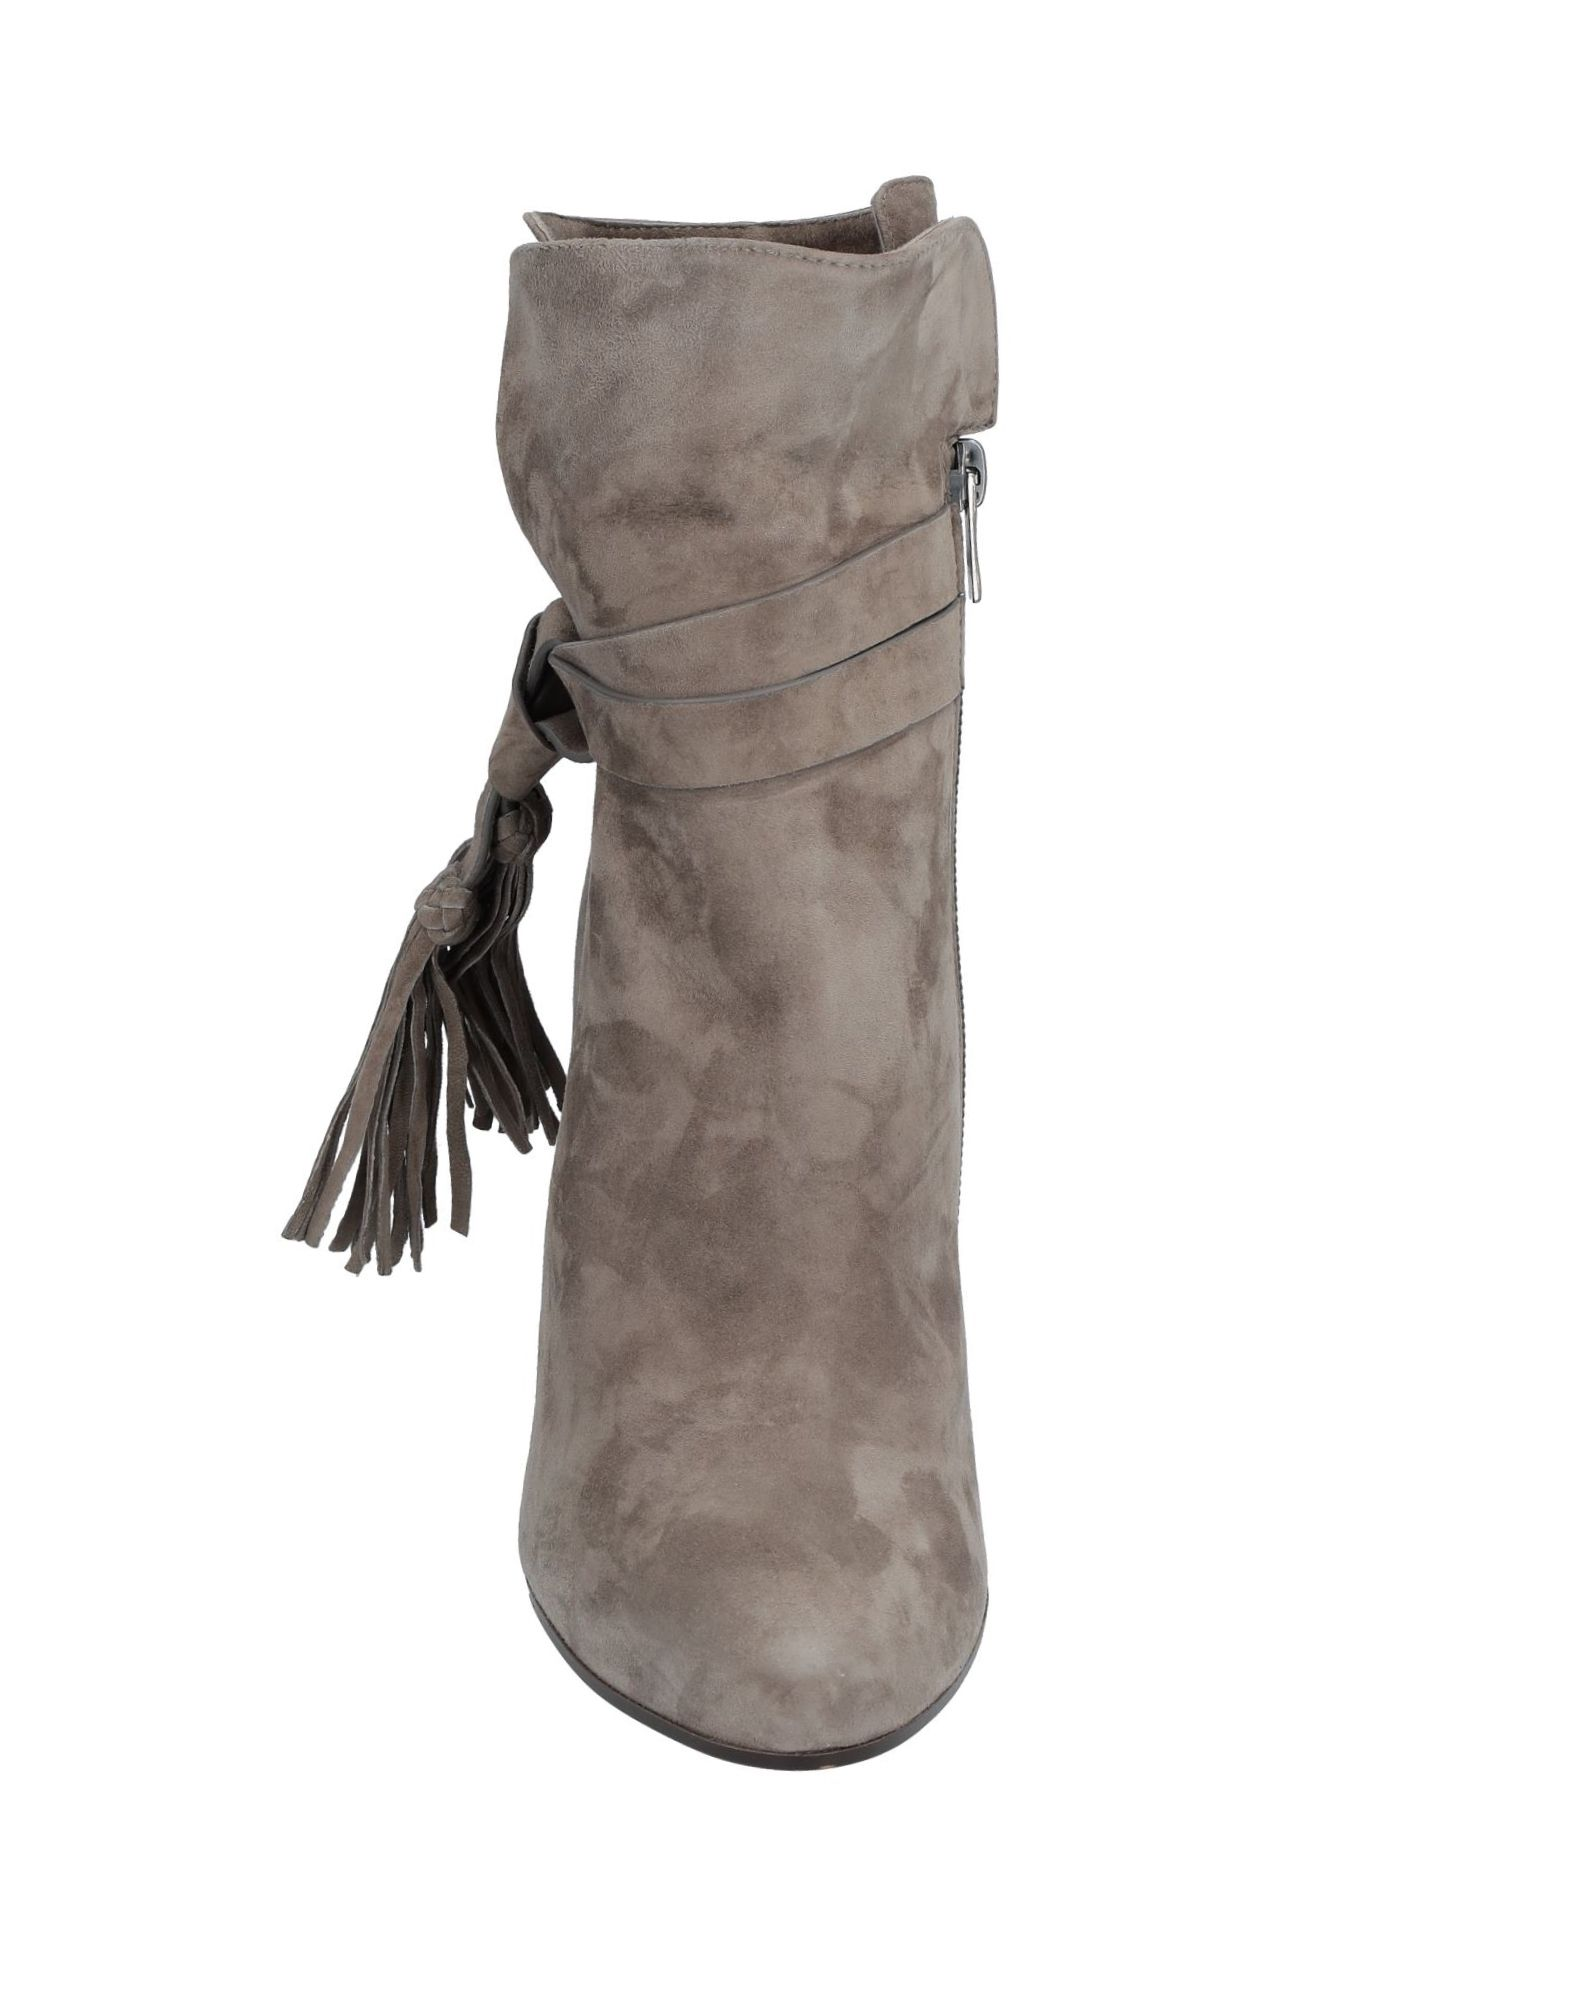 Stilvolle billige Schuhe Pura López 11529286WO Stiefelette Damen  11529286WO López 4265af